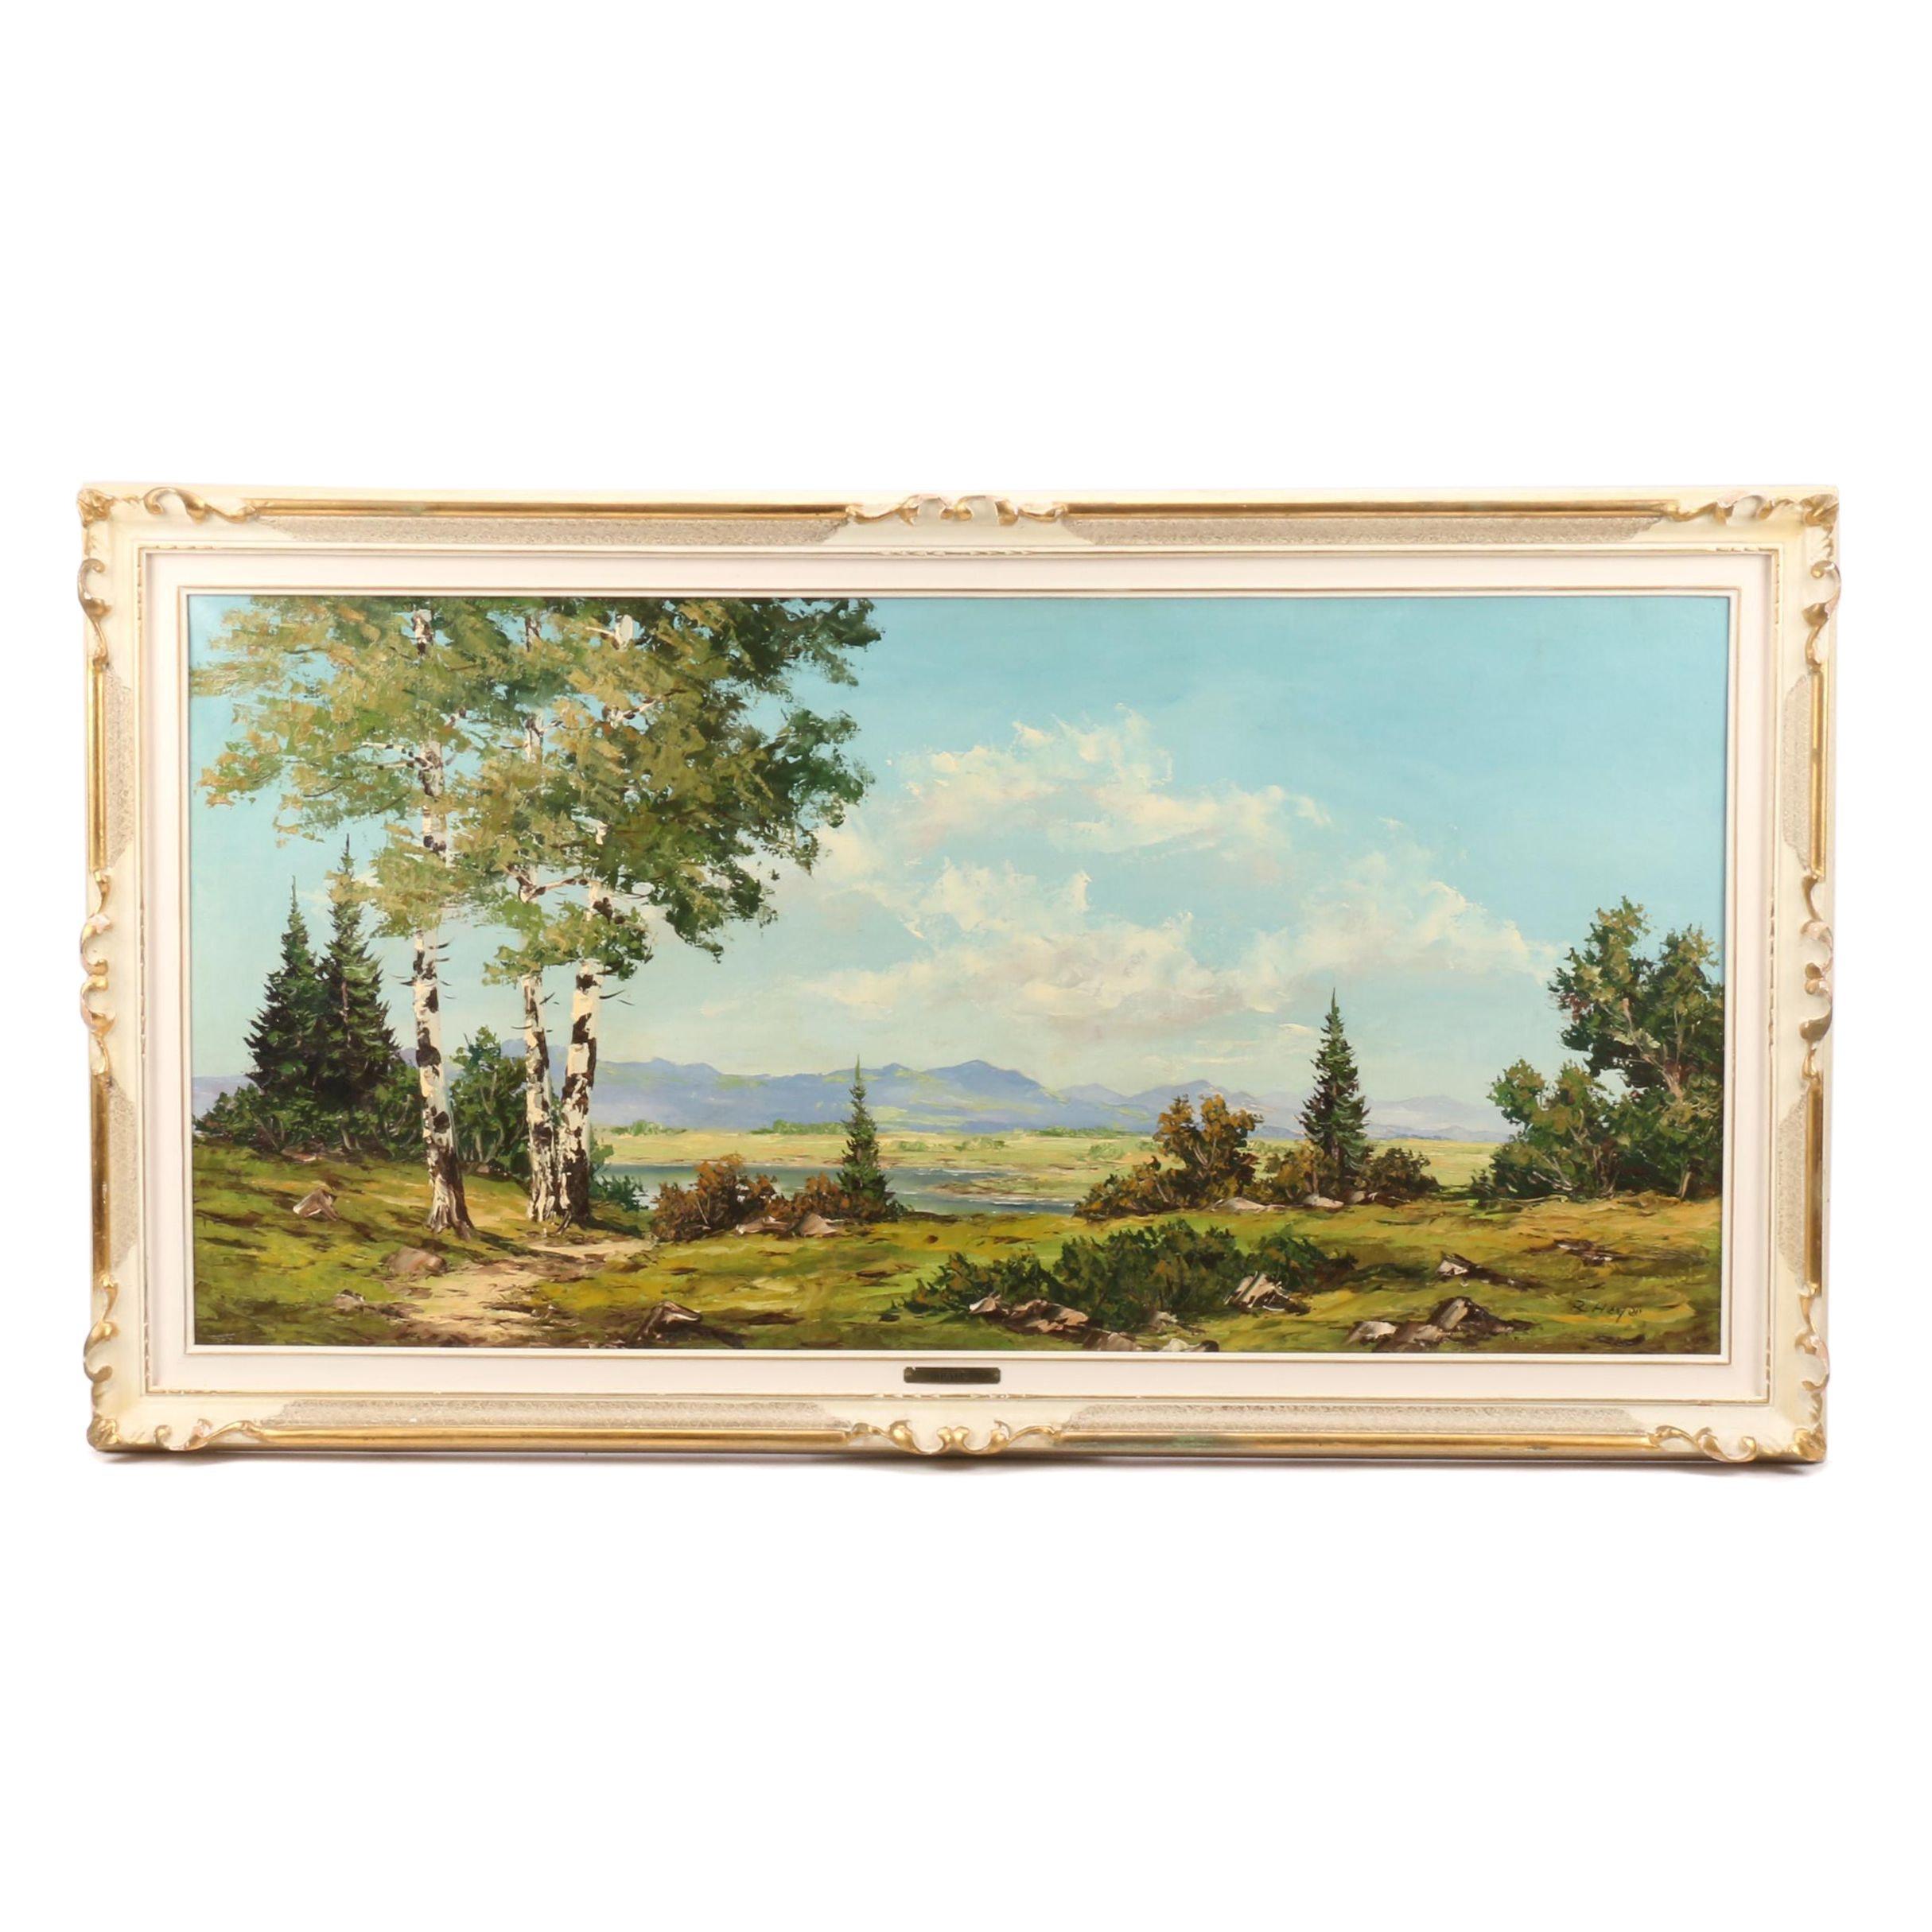 Robert Heyer Oil Painting of Expansive Landscape